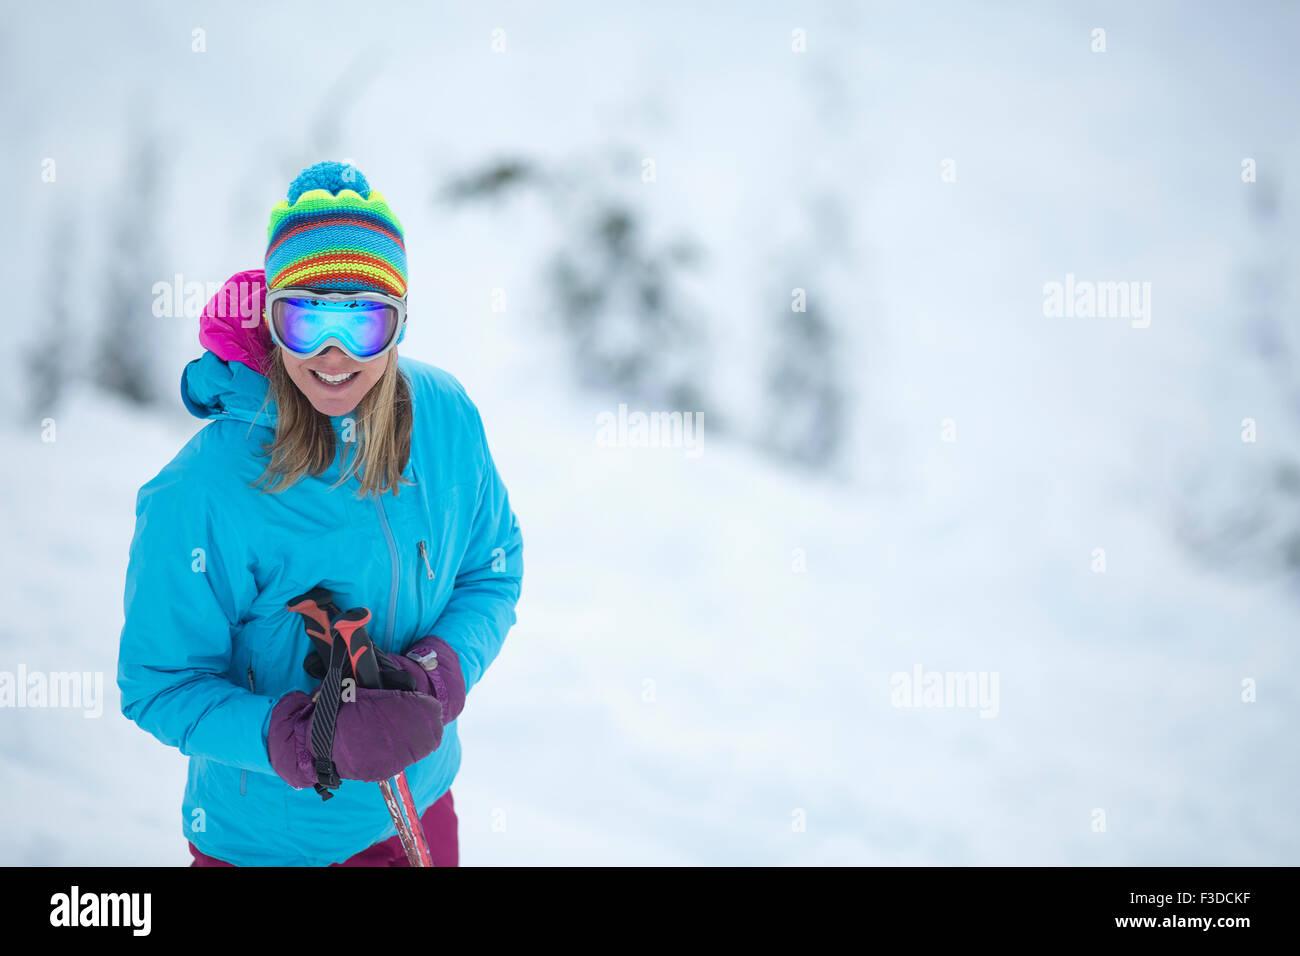 Smiley woman wearing skiwear on ski slope - Stock Image